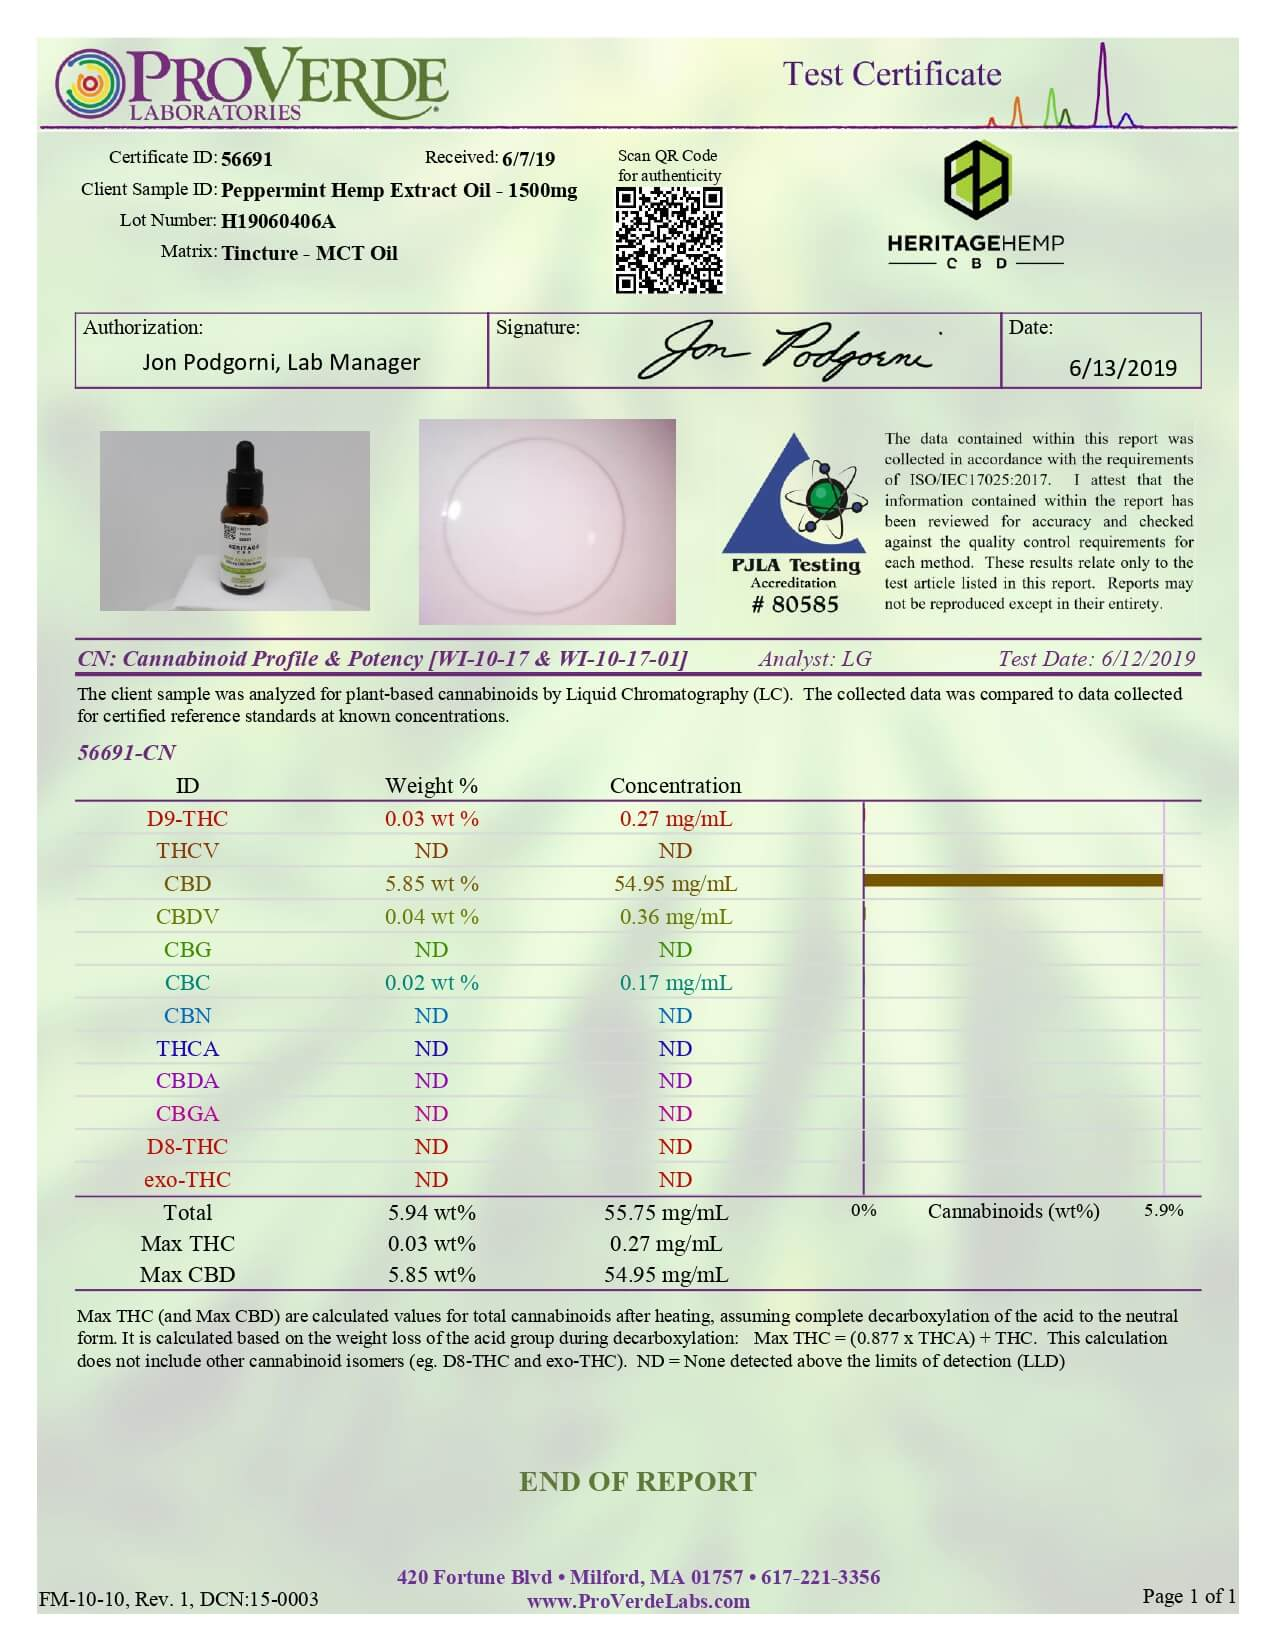 Heritage Hemp CBD Tincture Peppermint 1500mg Lab Report